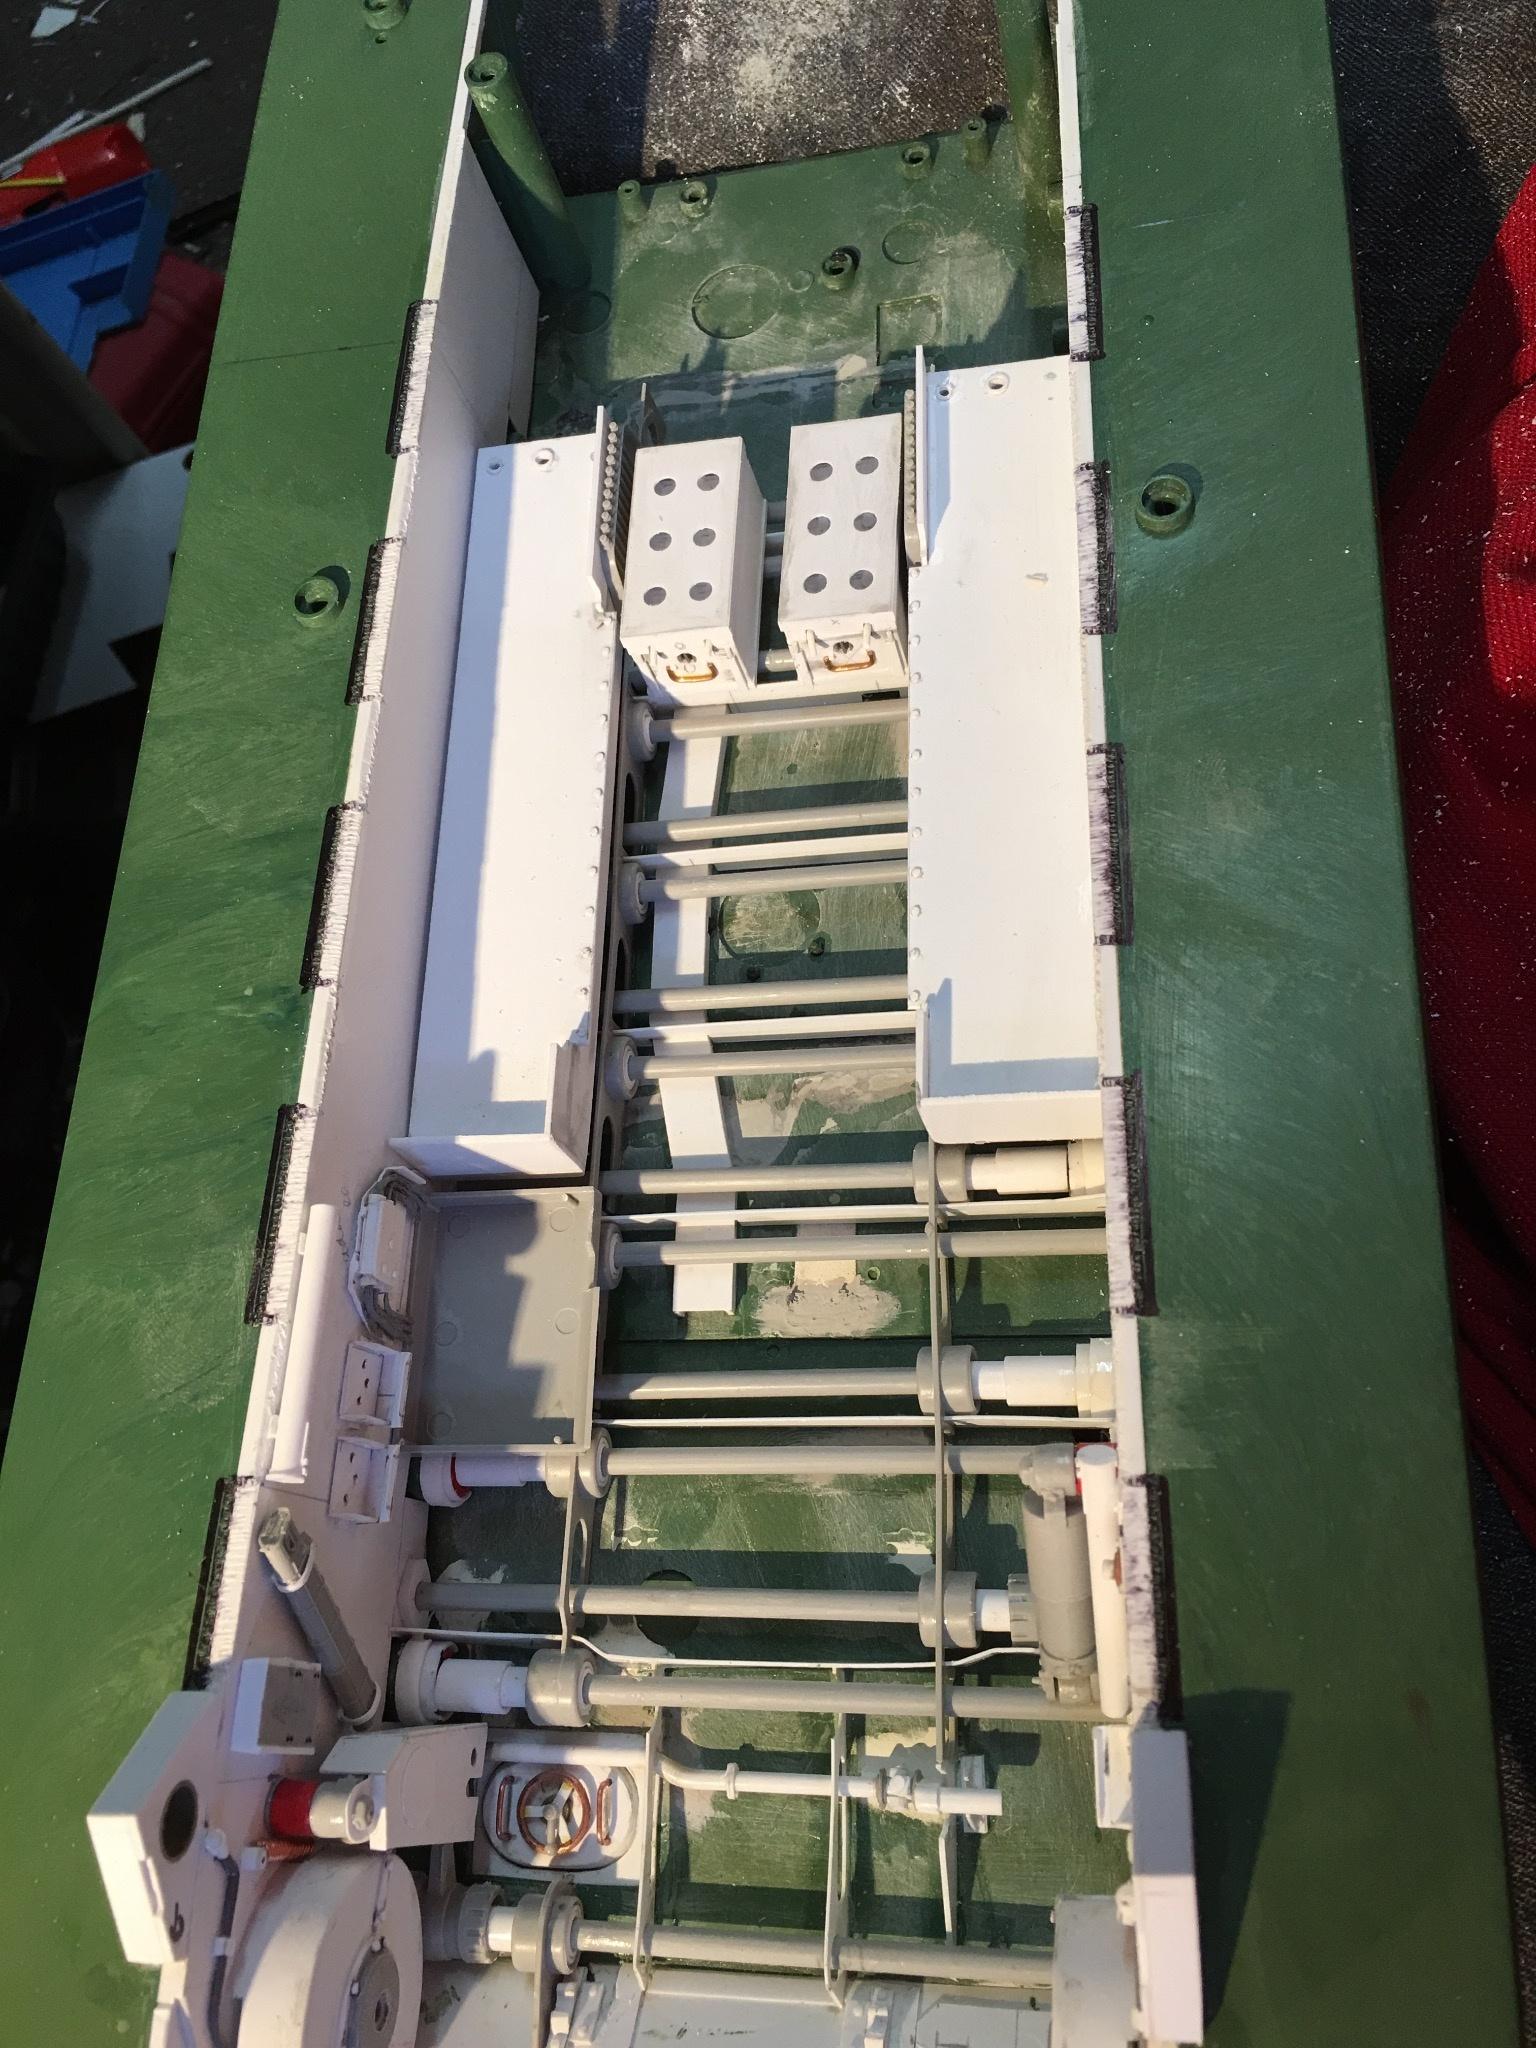 FDBD8919-0B2C-4789-8C5E-ED0BC9AE55D5.jpeg